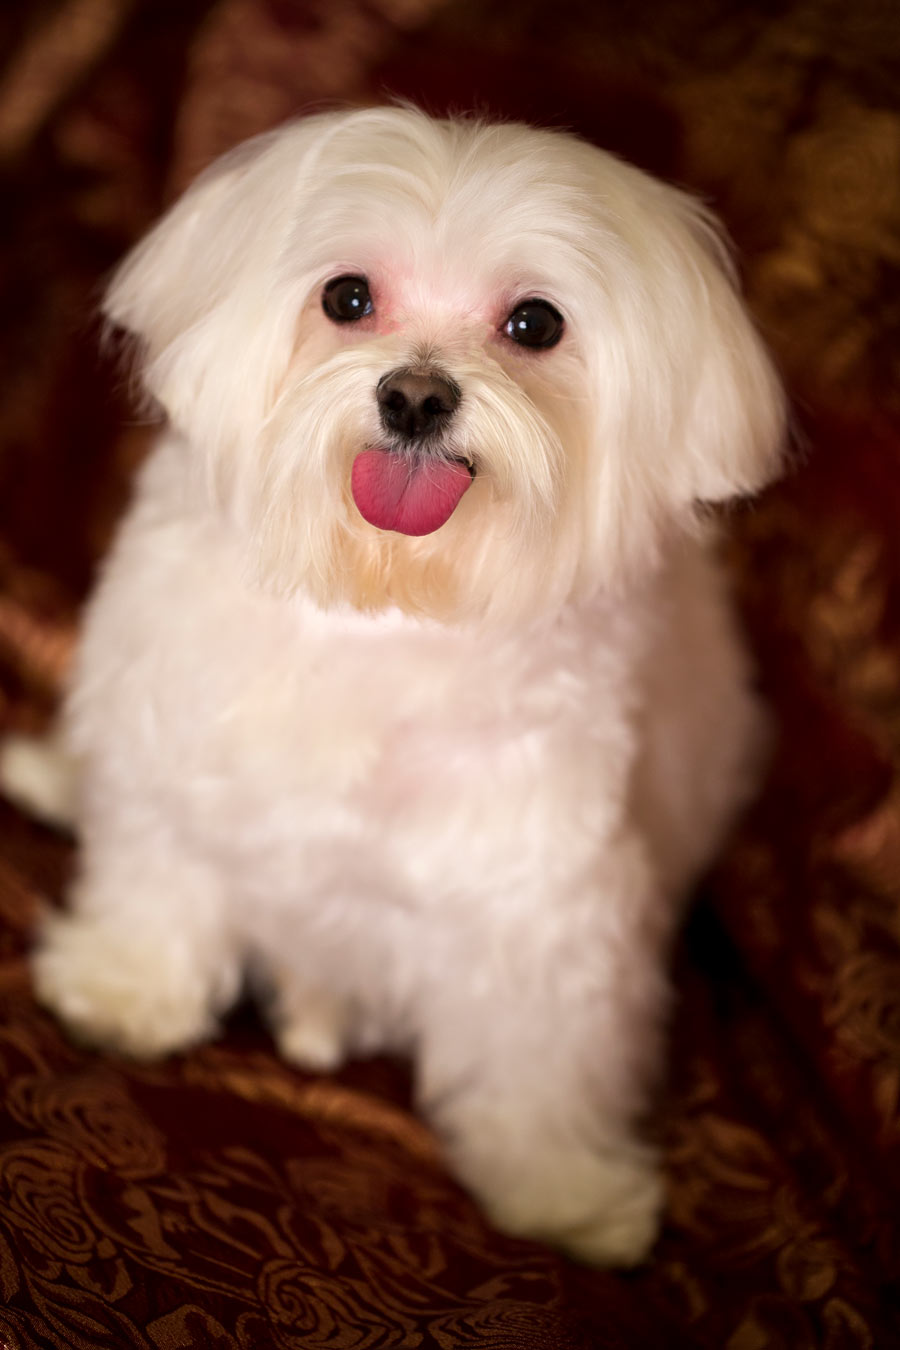 Junior Leslie's Dog - Pet photographer in new york